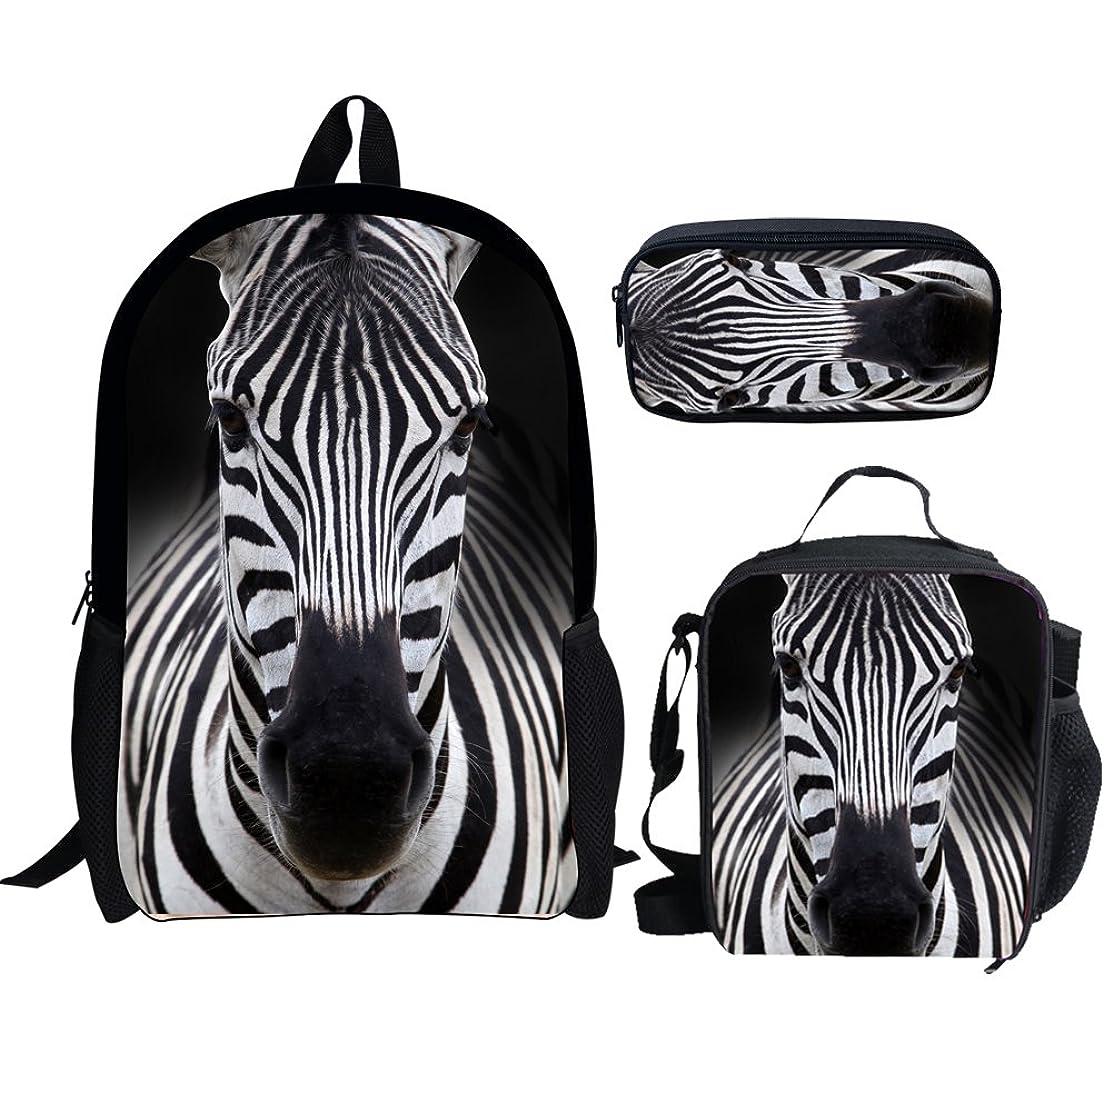 Bigcardesigns Little Kids School Bags Set Backpack Lunch Bag Pencil Case 3 Pieces